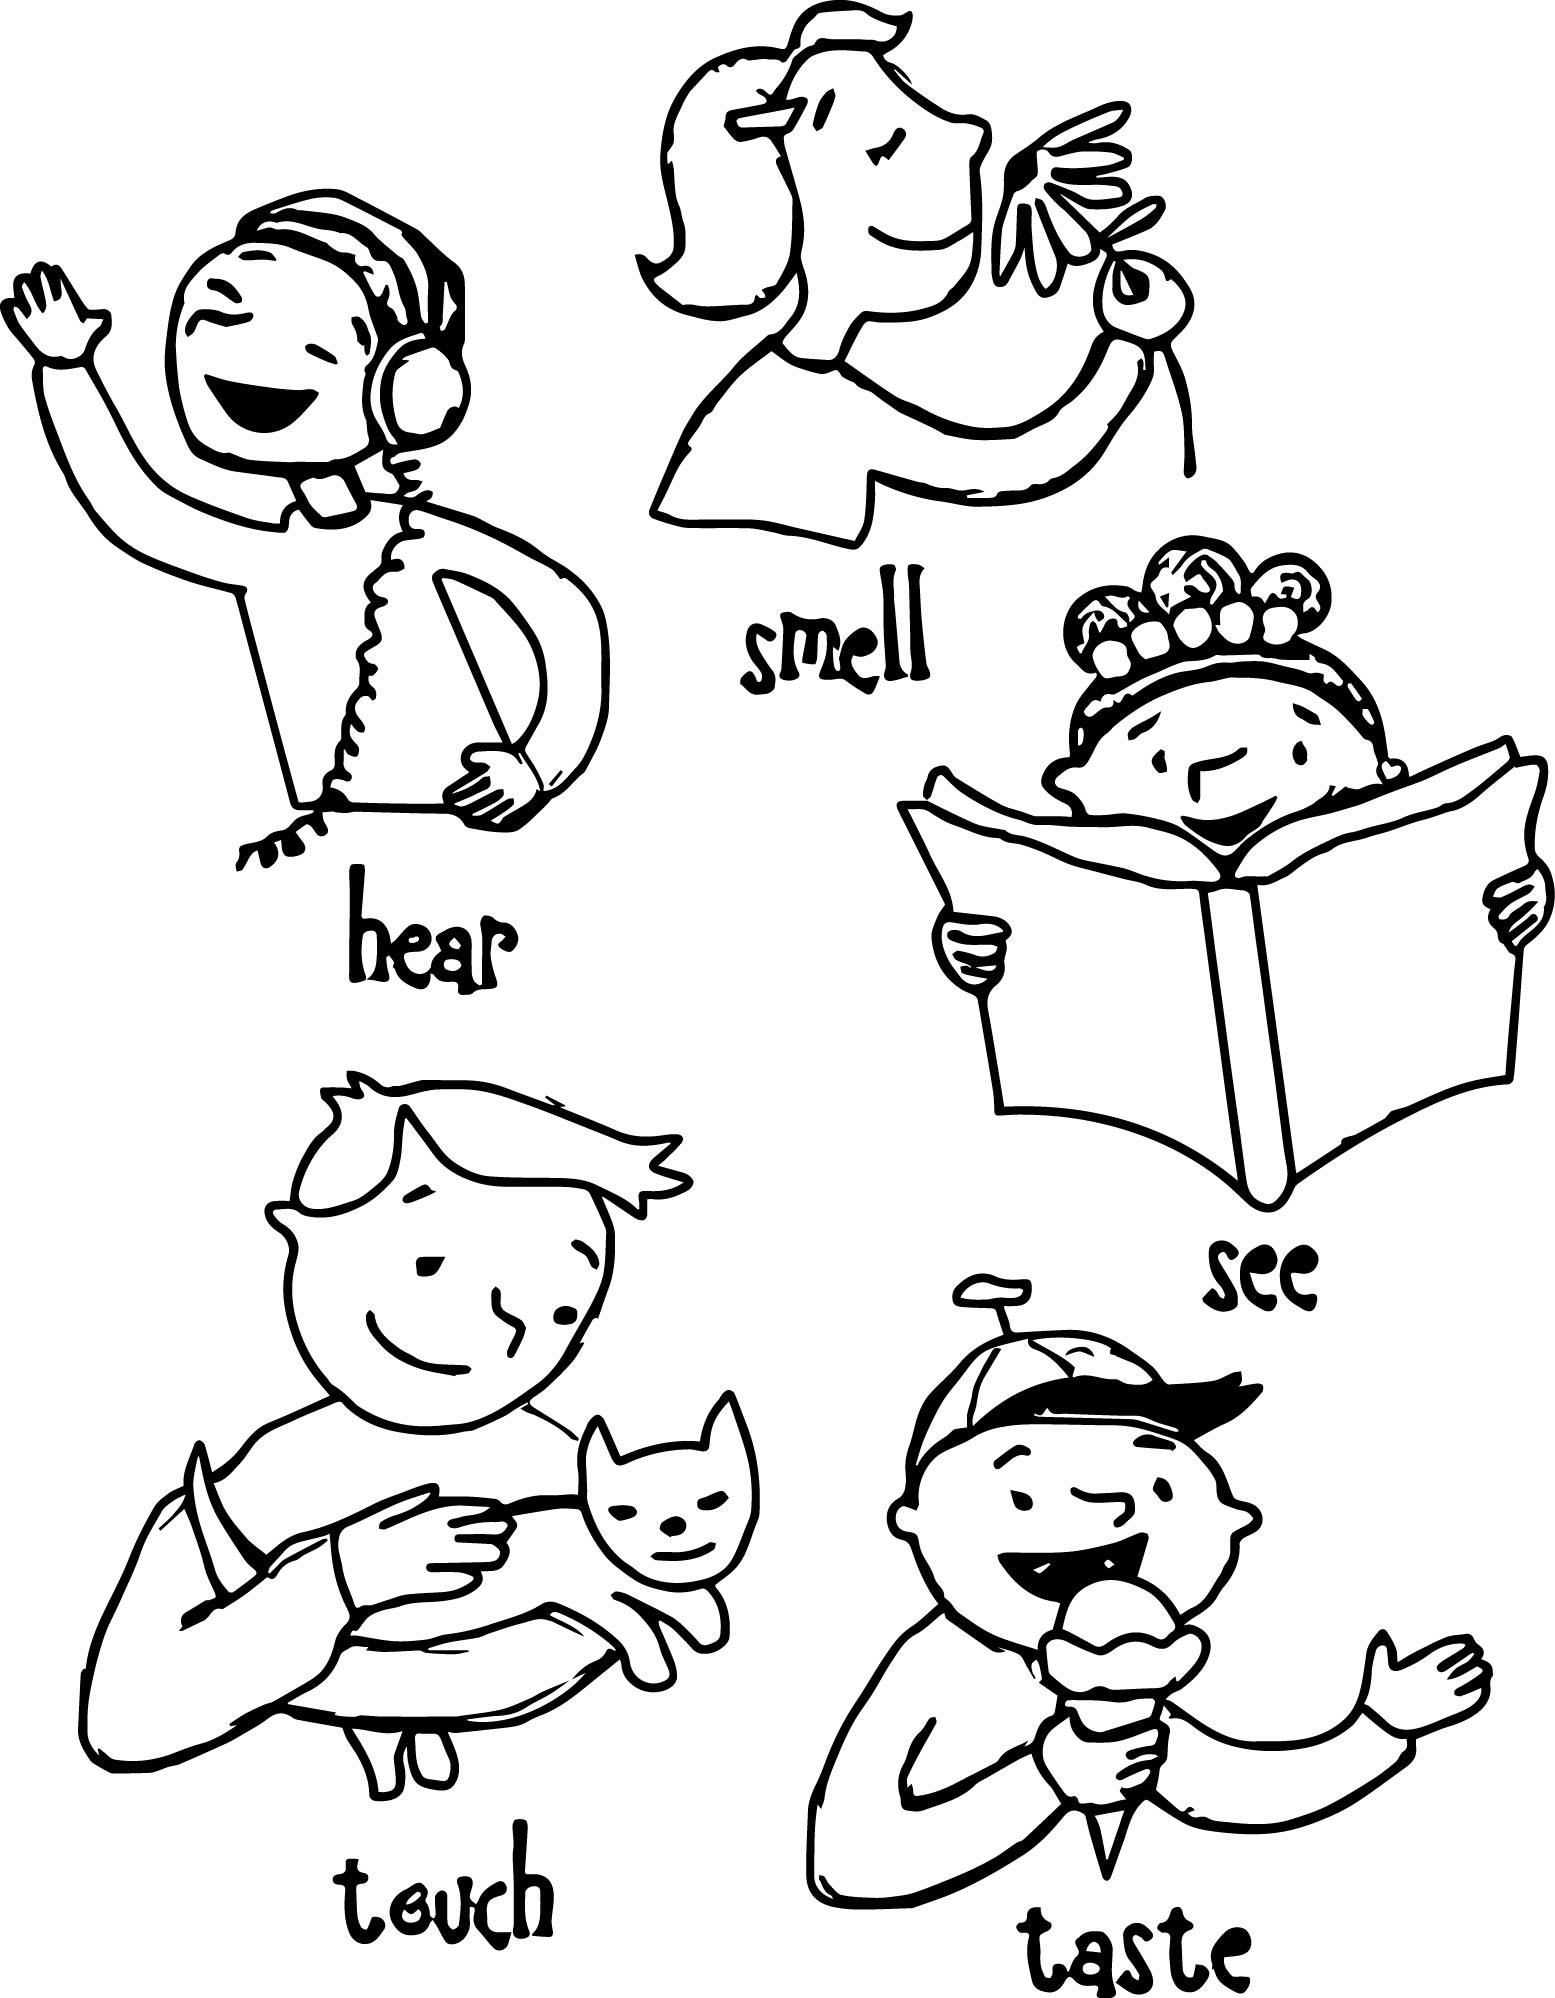 5 Senses Clipart Coloring Page 5 Senses Coloring Page